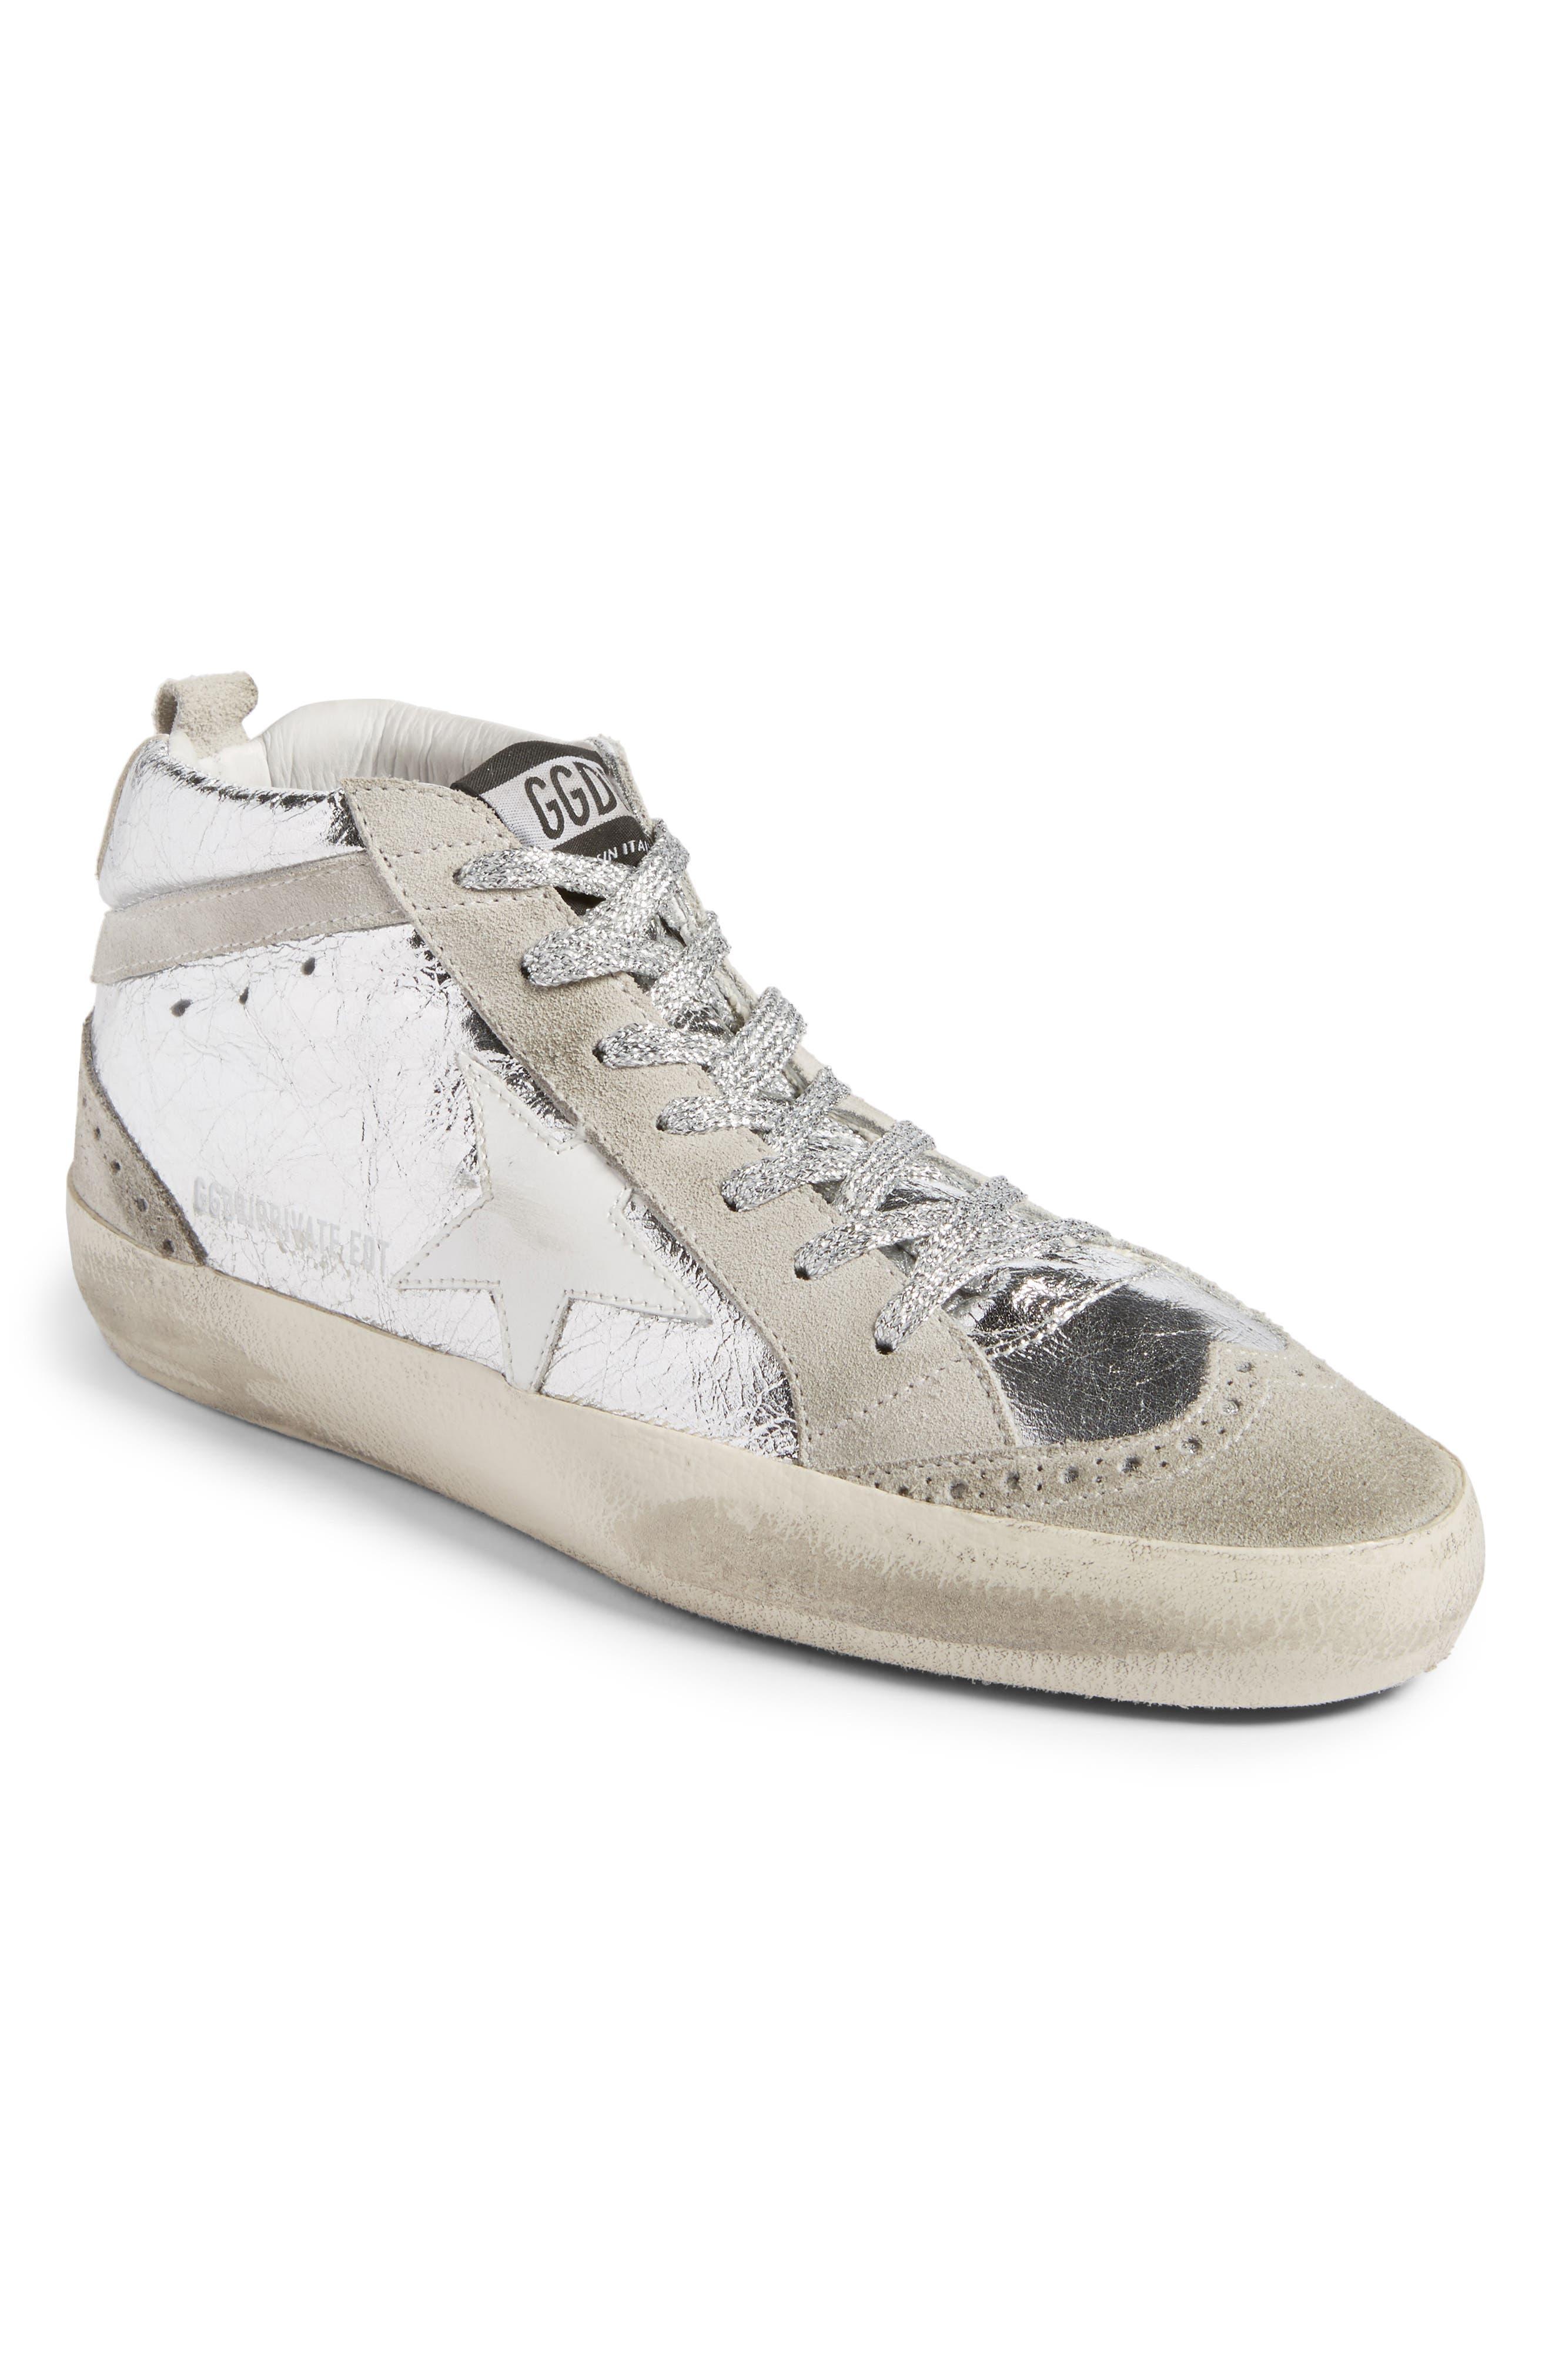 Alternate Image 1 Selected - Golden Goose Mid Star Metallic Sneaker (Women)